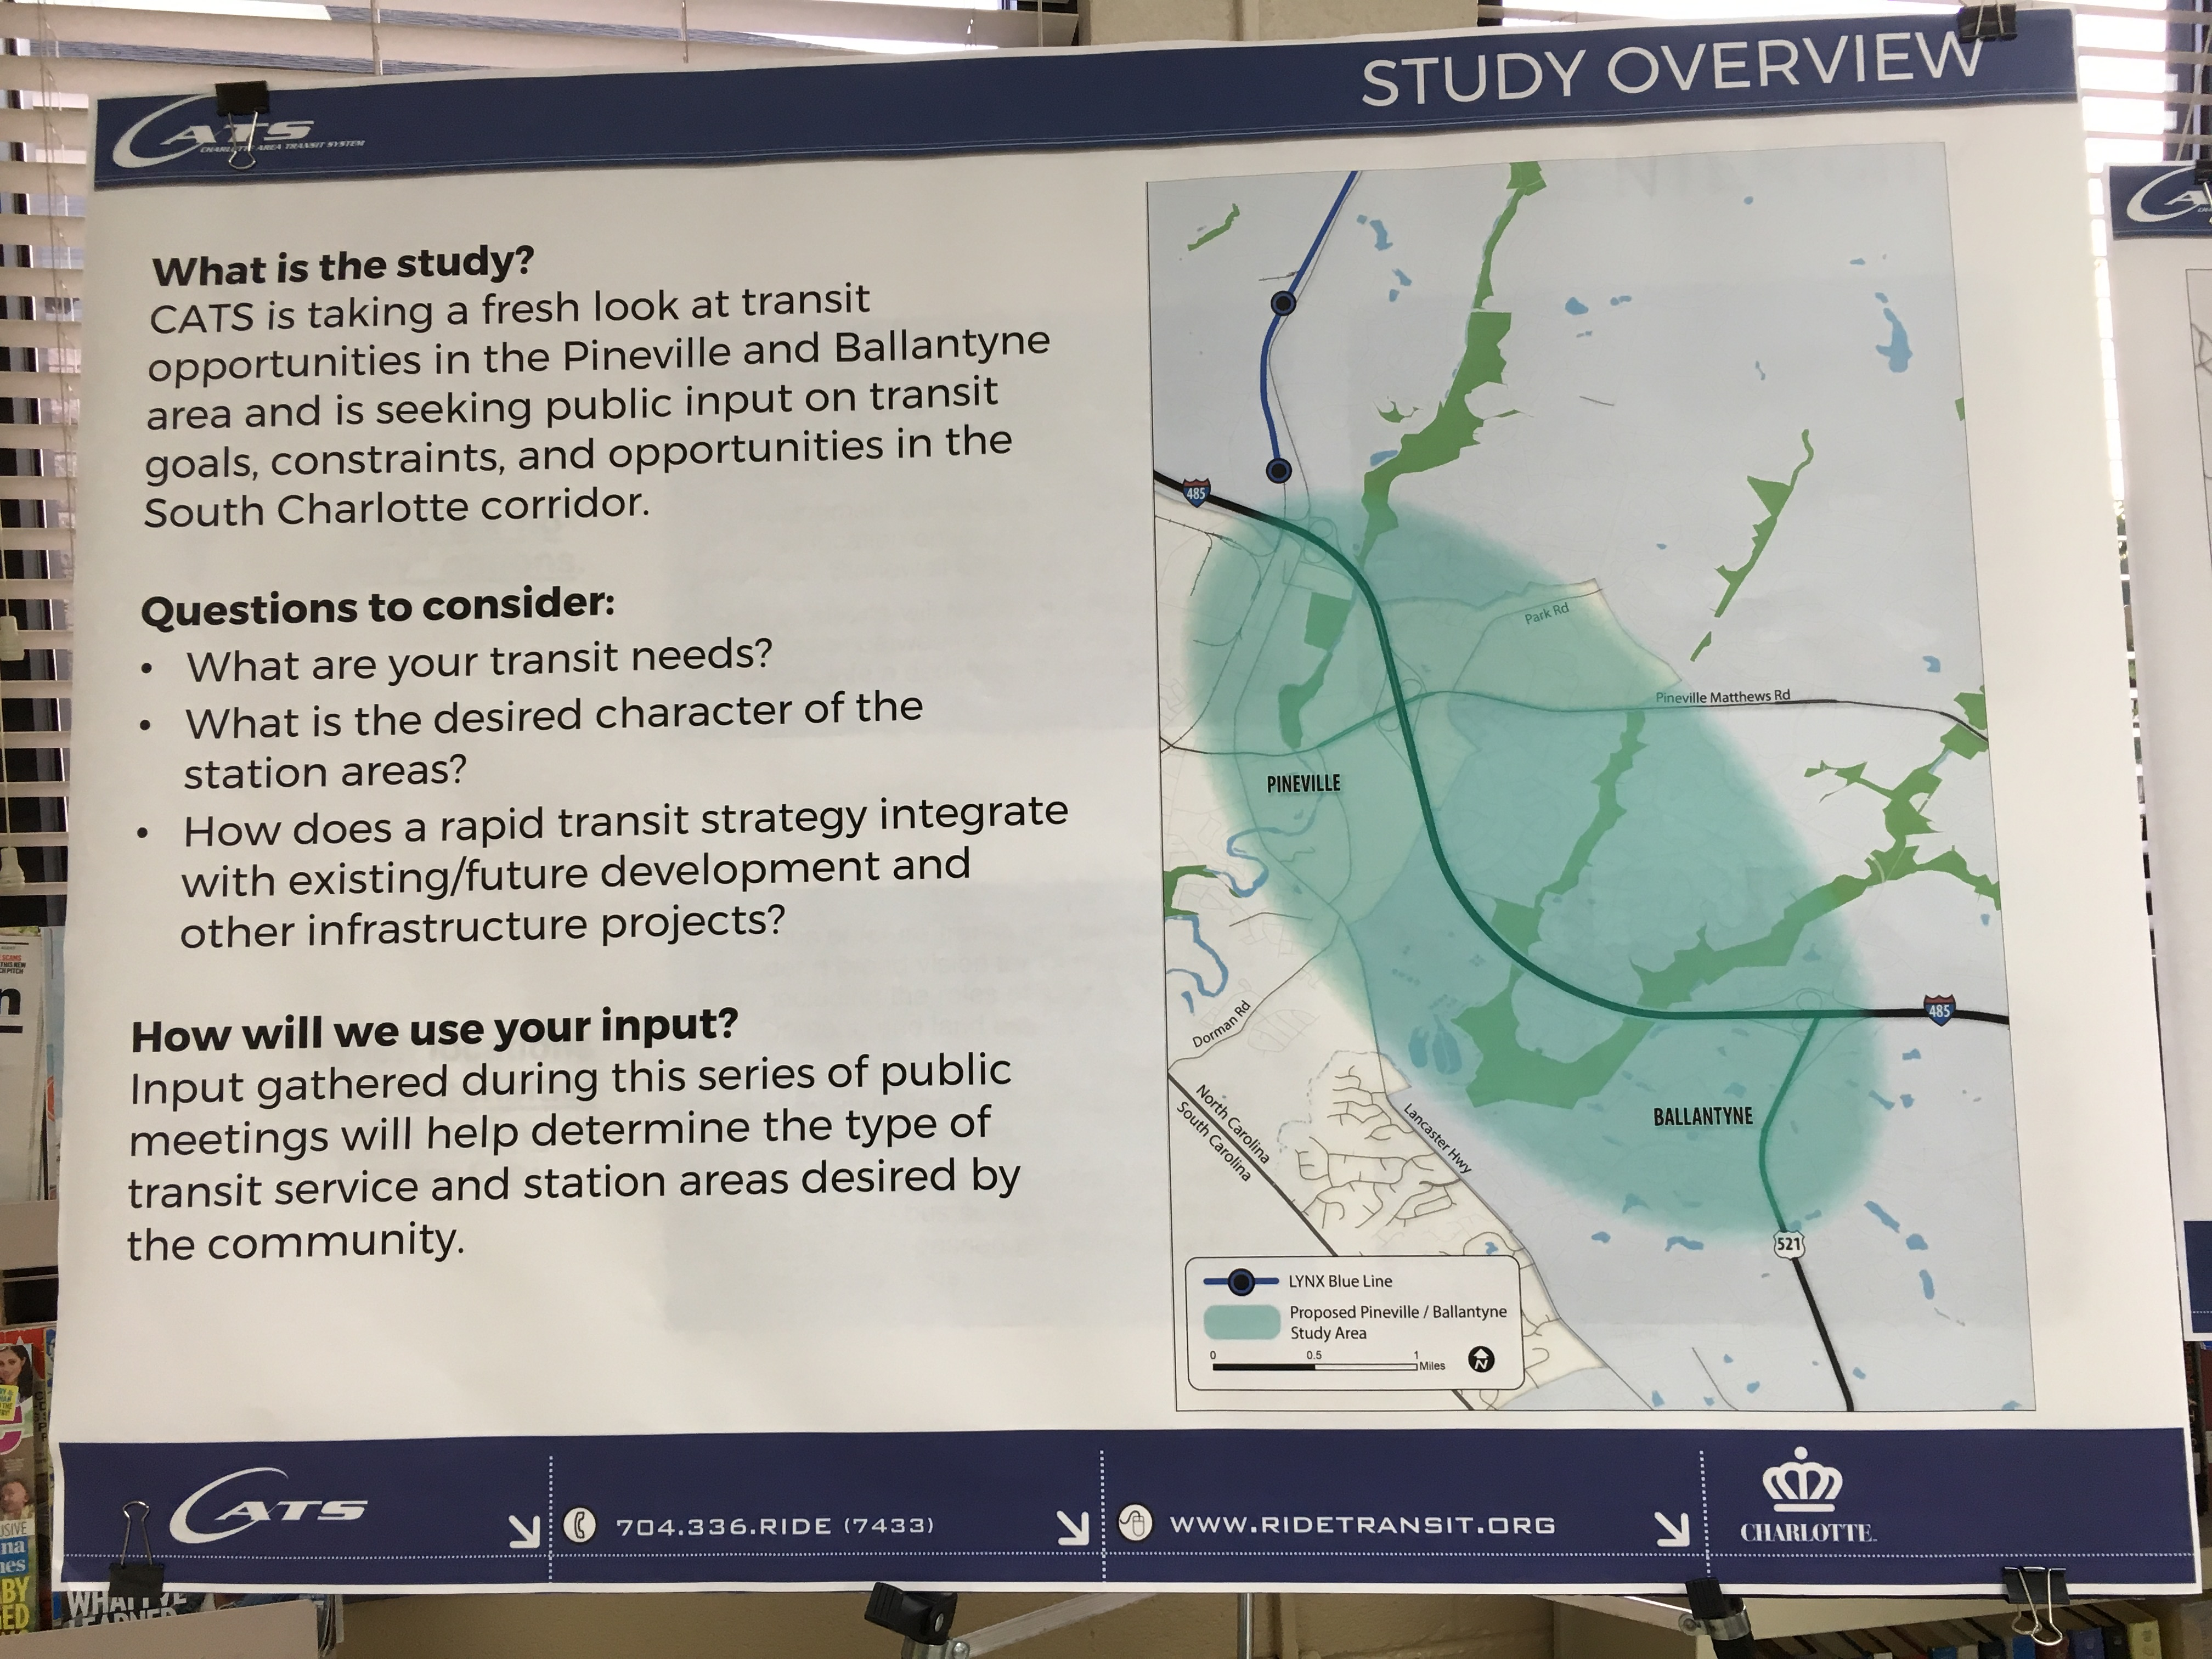 2030 Transit System Study Pineville and Ballantyne